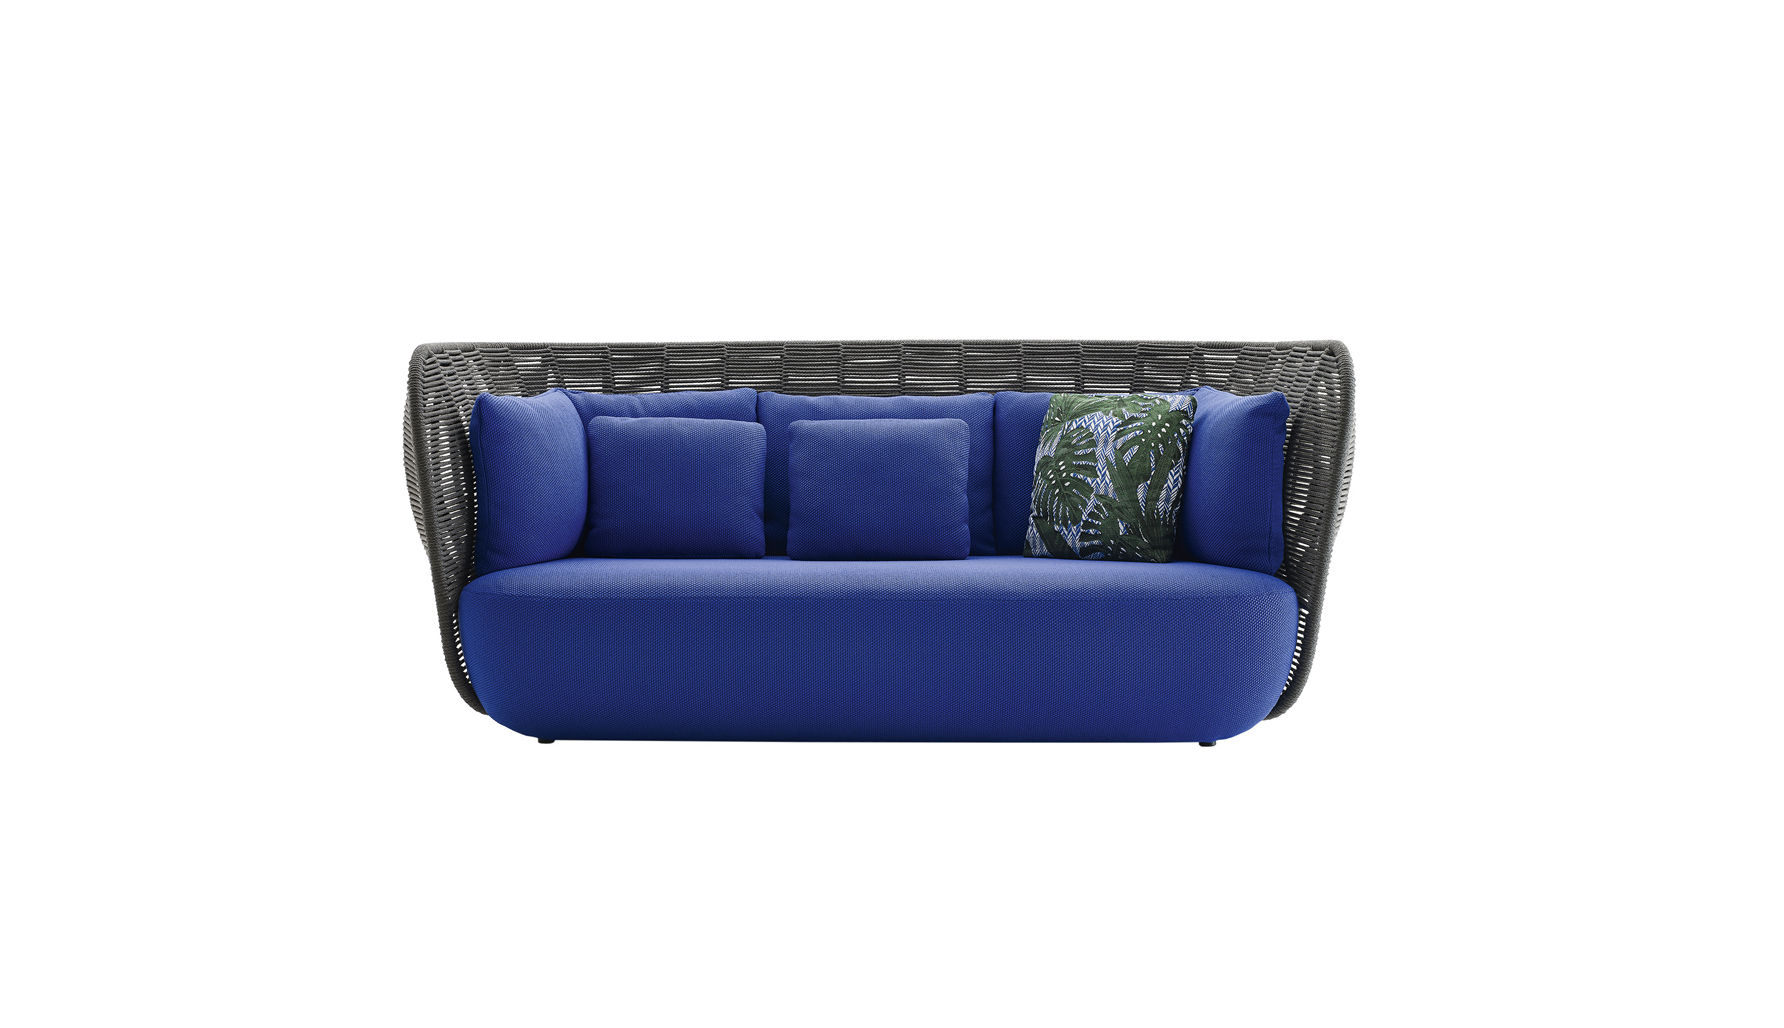 Bay sofa 2.png